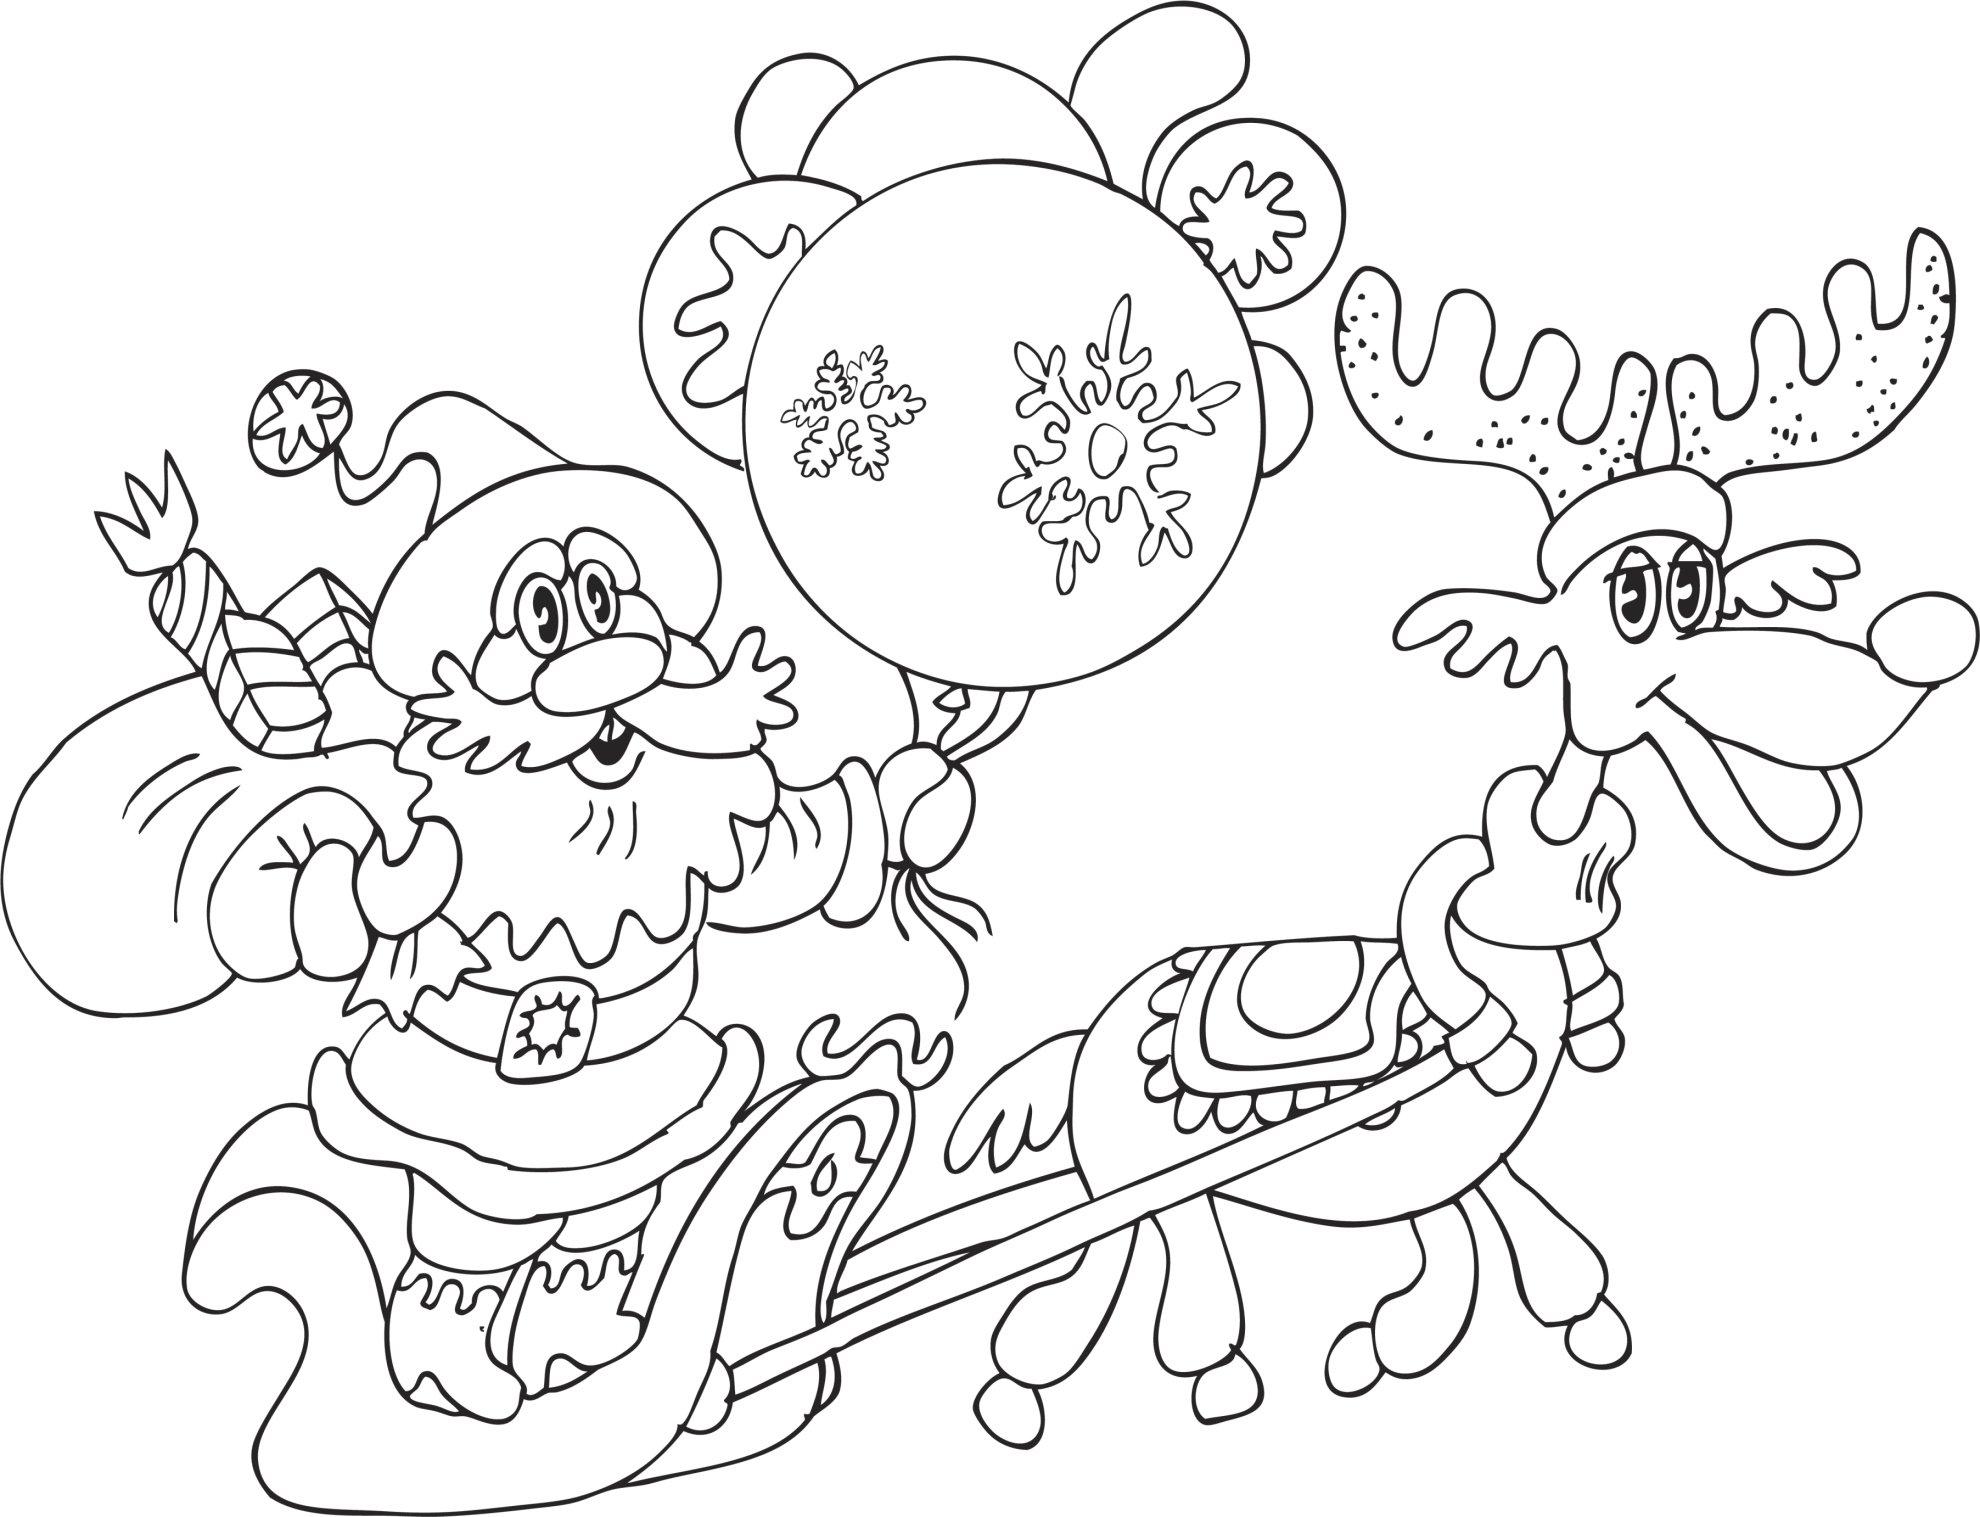 Niños Para Colorear E Imprimir: Dibujos De Navidad Para Colorear, Imágenes Navidad Para